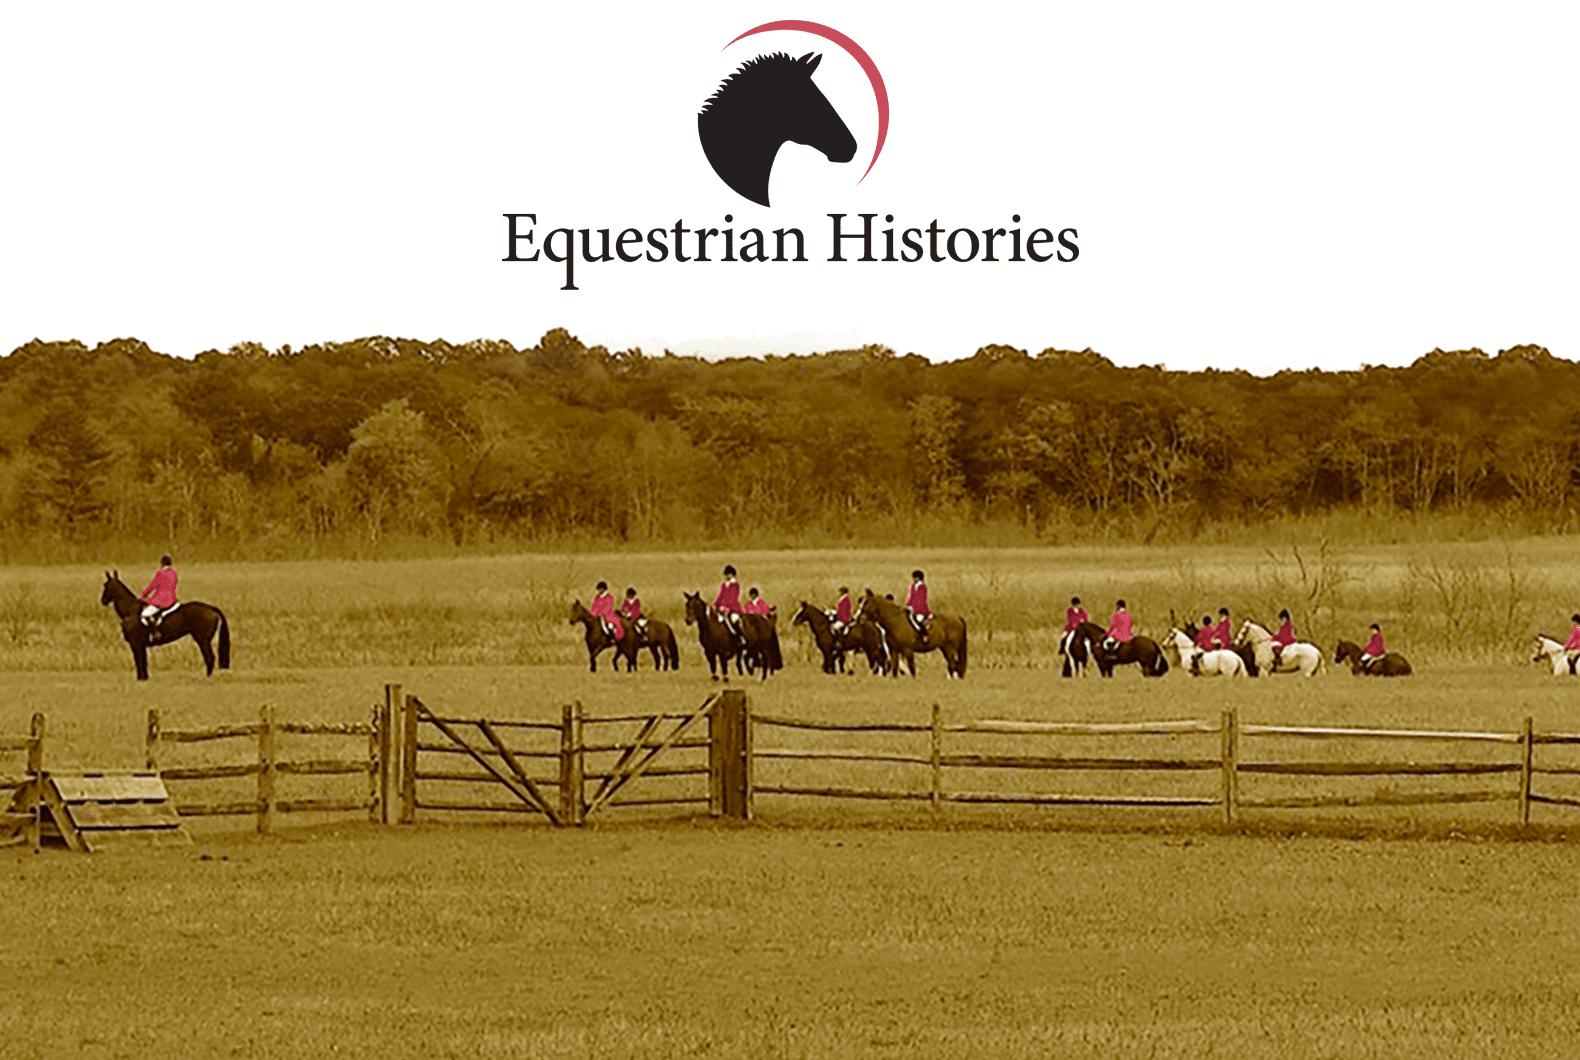 Equestrian Histories